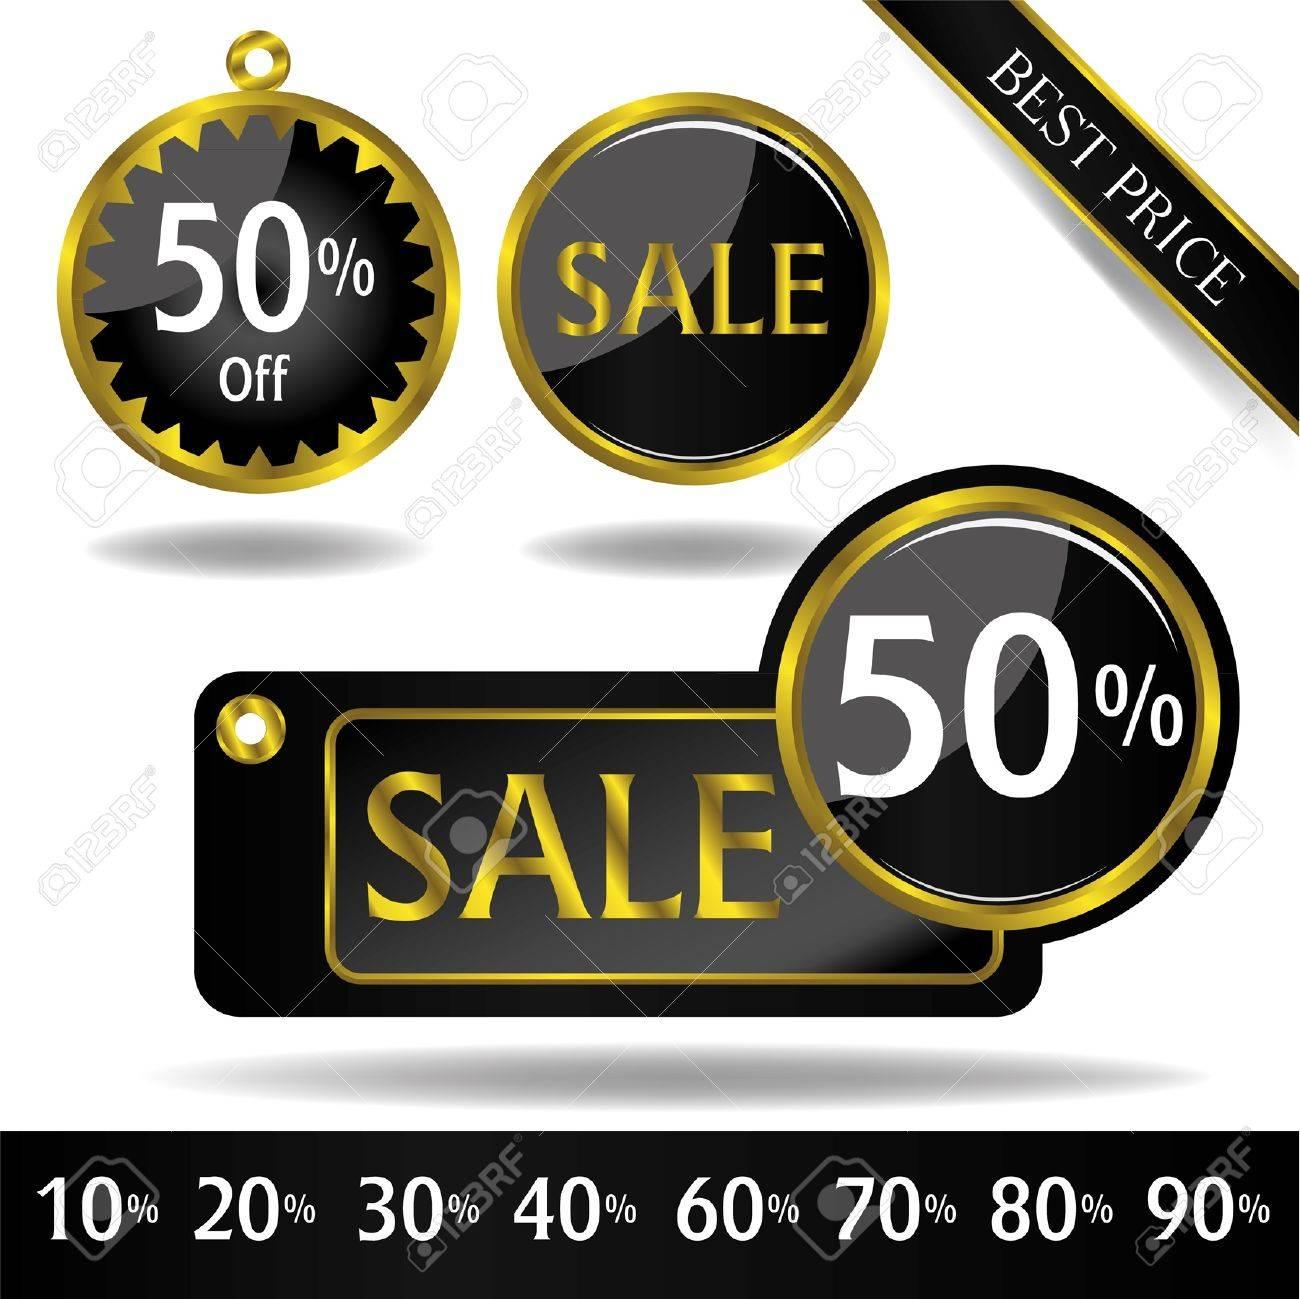 black gold price tag vector Stock Vector - 16297394